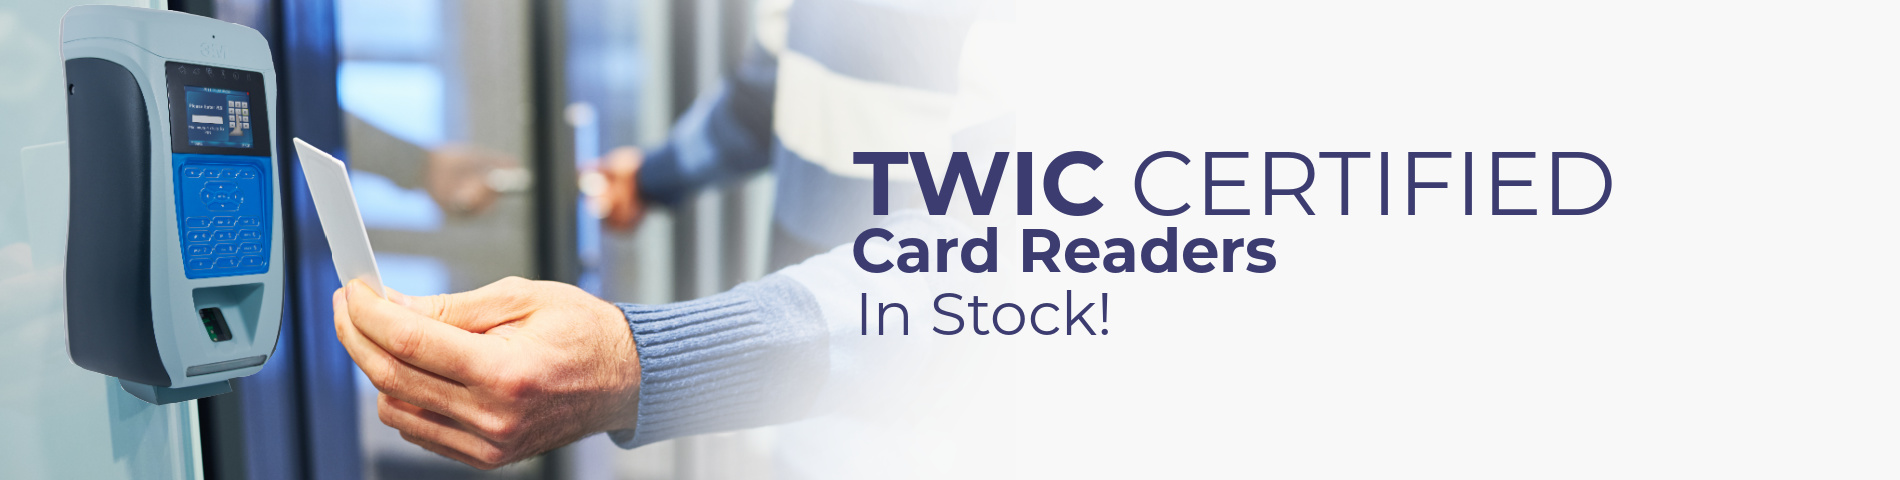 TWIC Card Readers